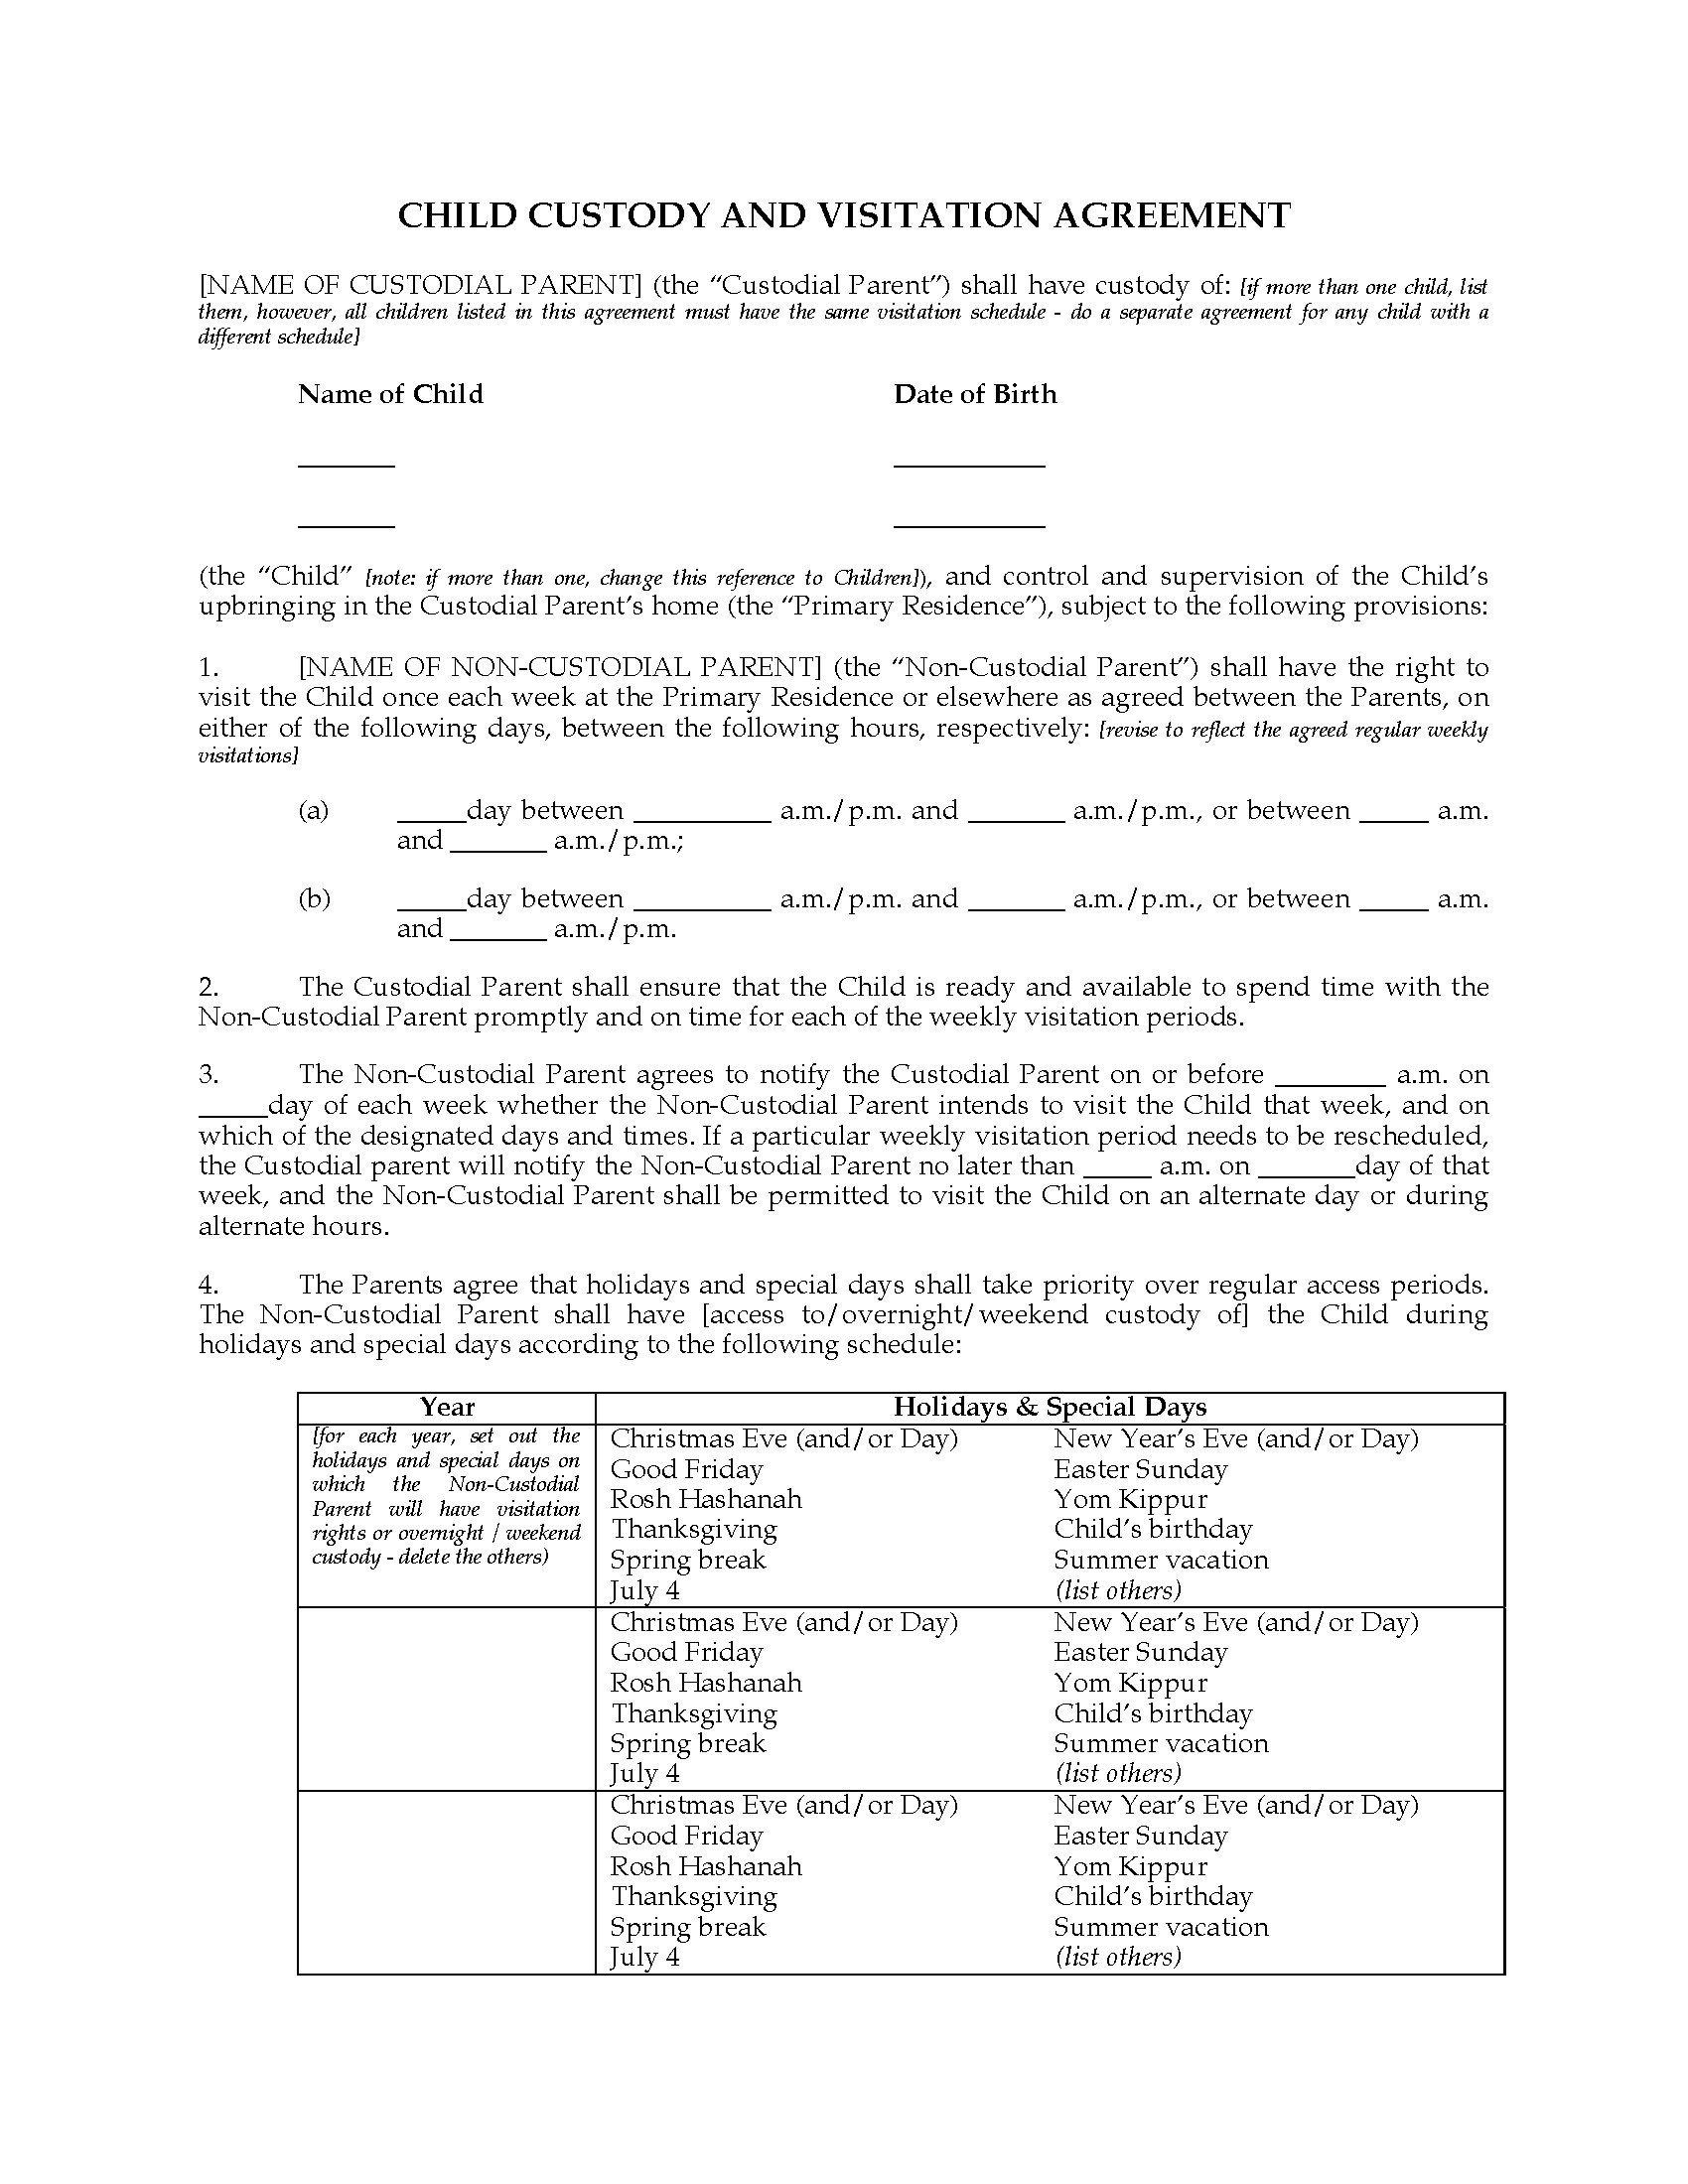 Child Custody Agreements Templates Usa Child Custody and Visitation Agreement Between Parents